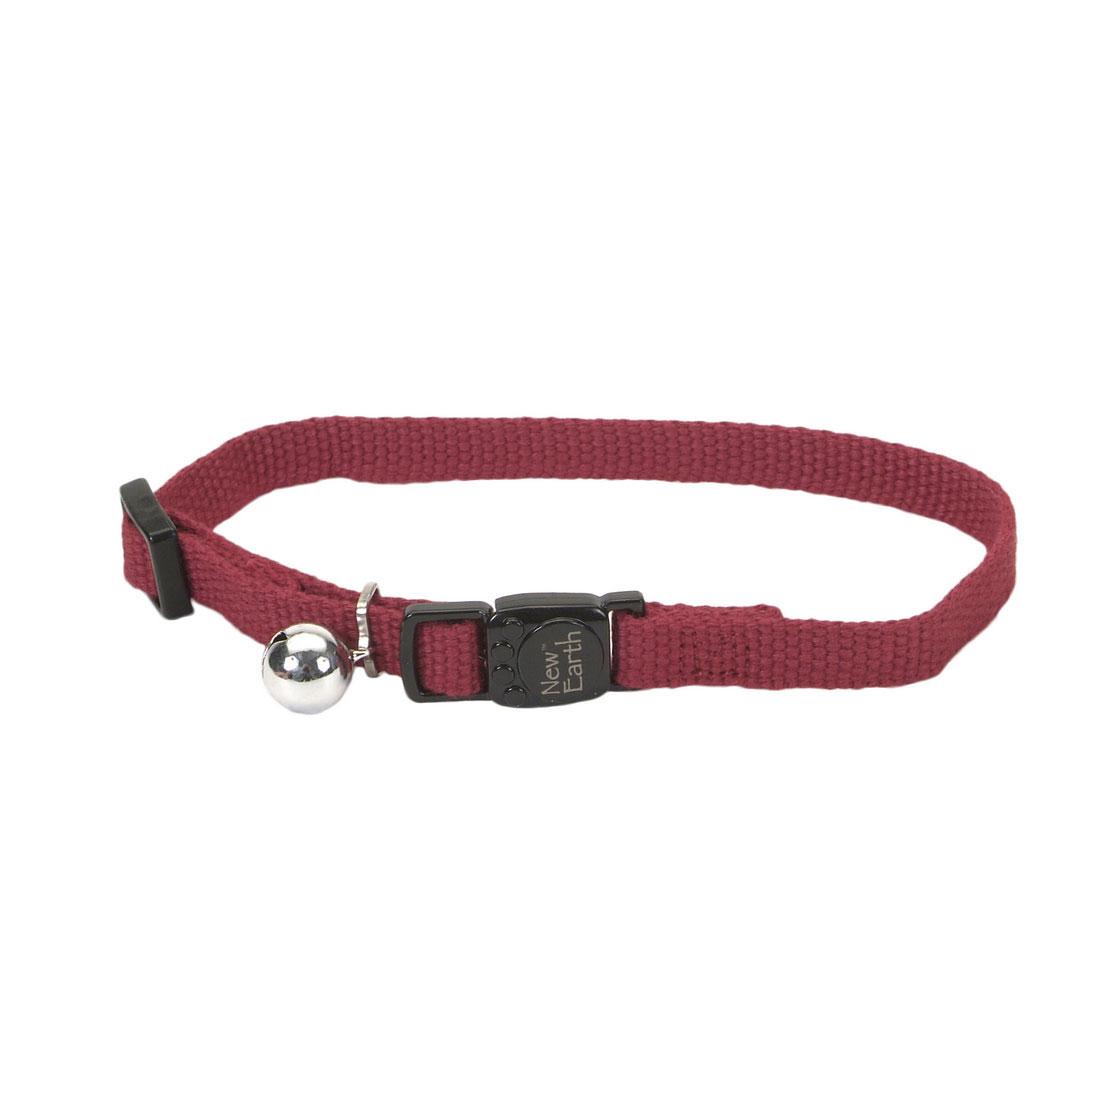 Coastal New Earth Soy Adjustable Breakaway Cat Collar, Cranberry, 8-12-in